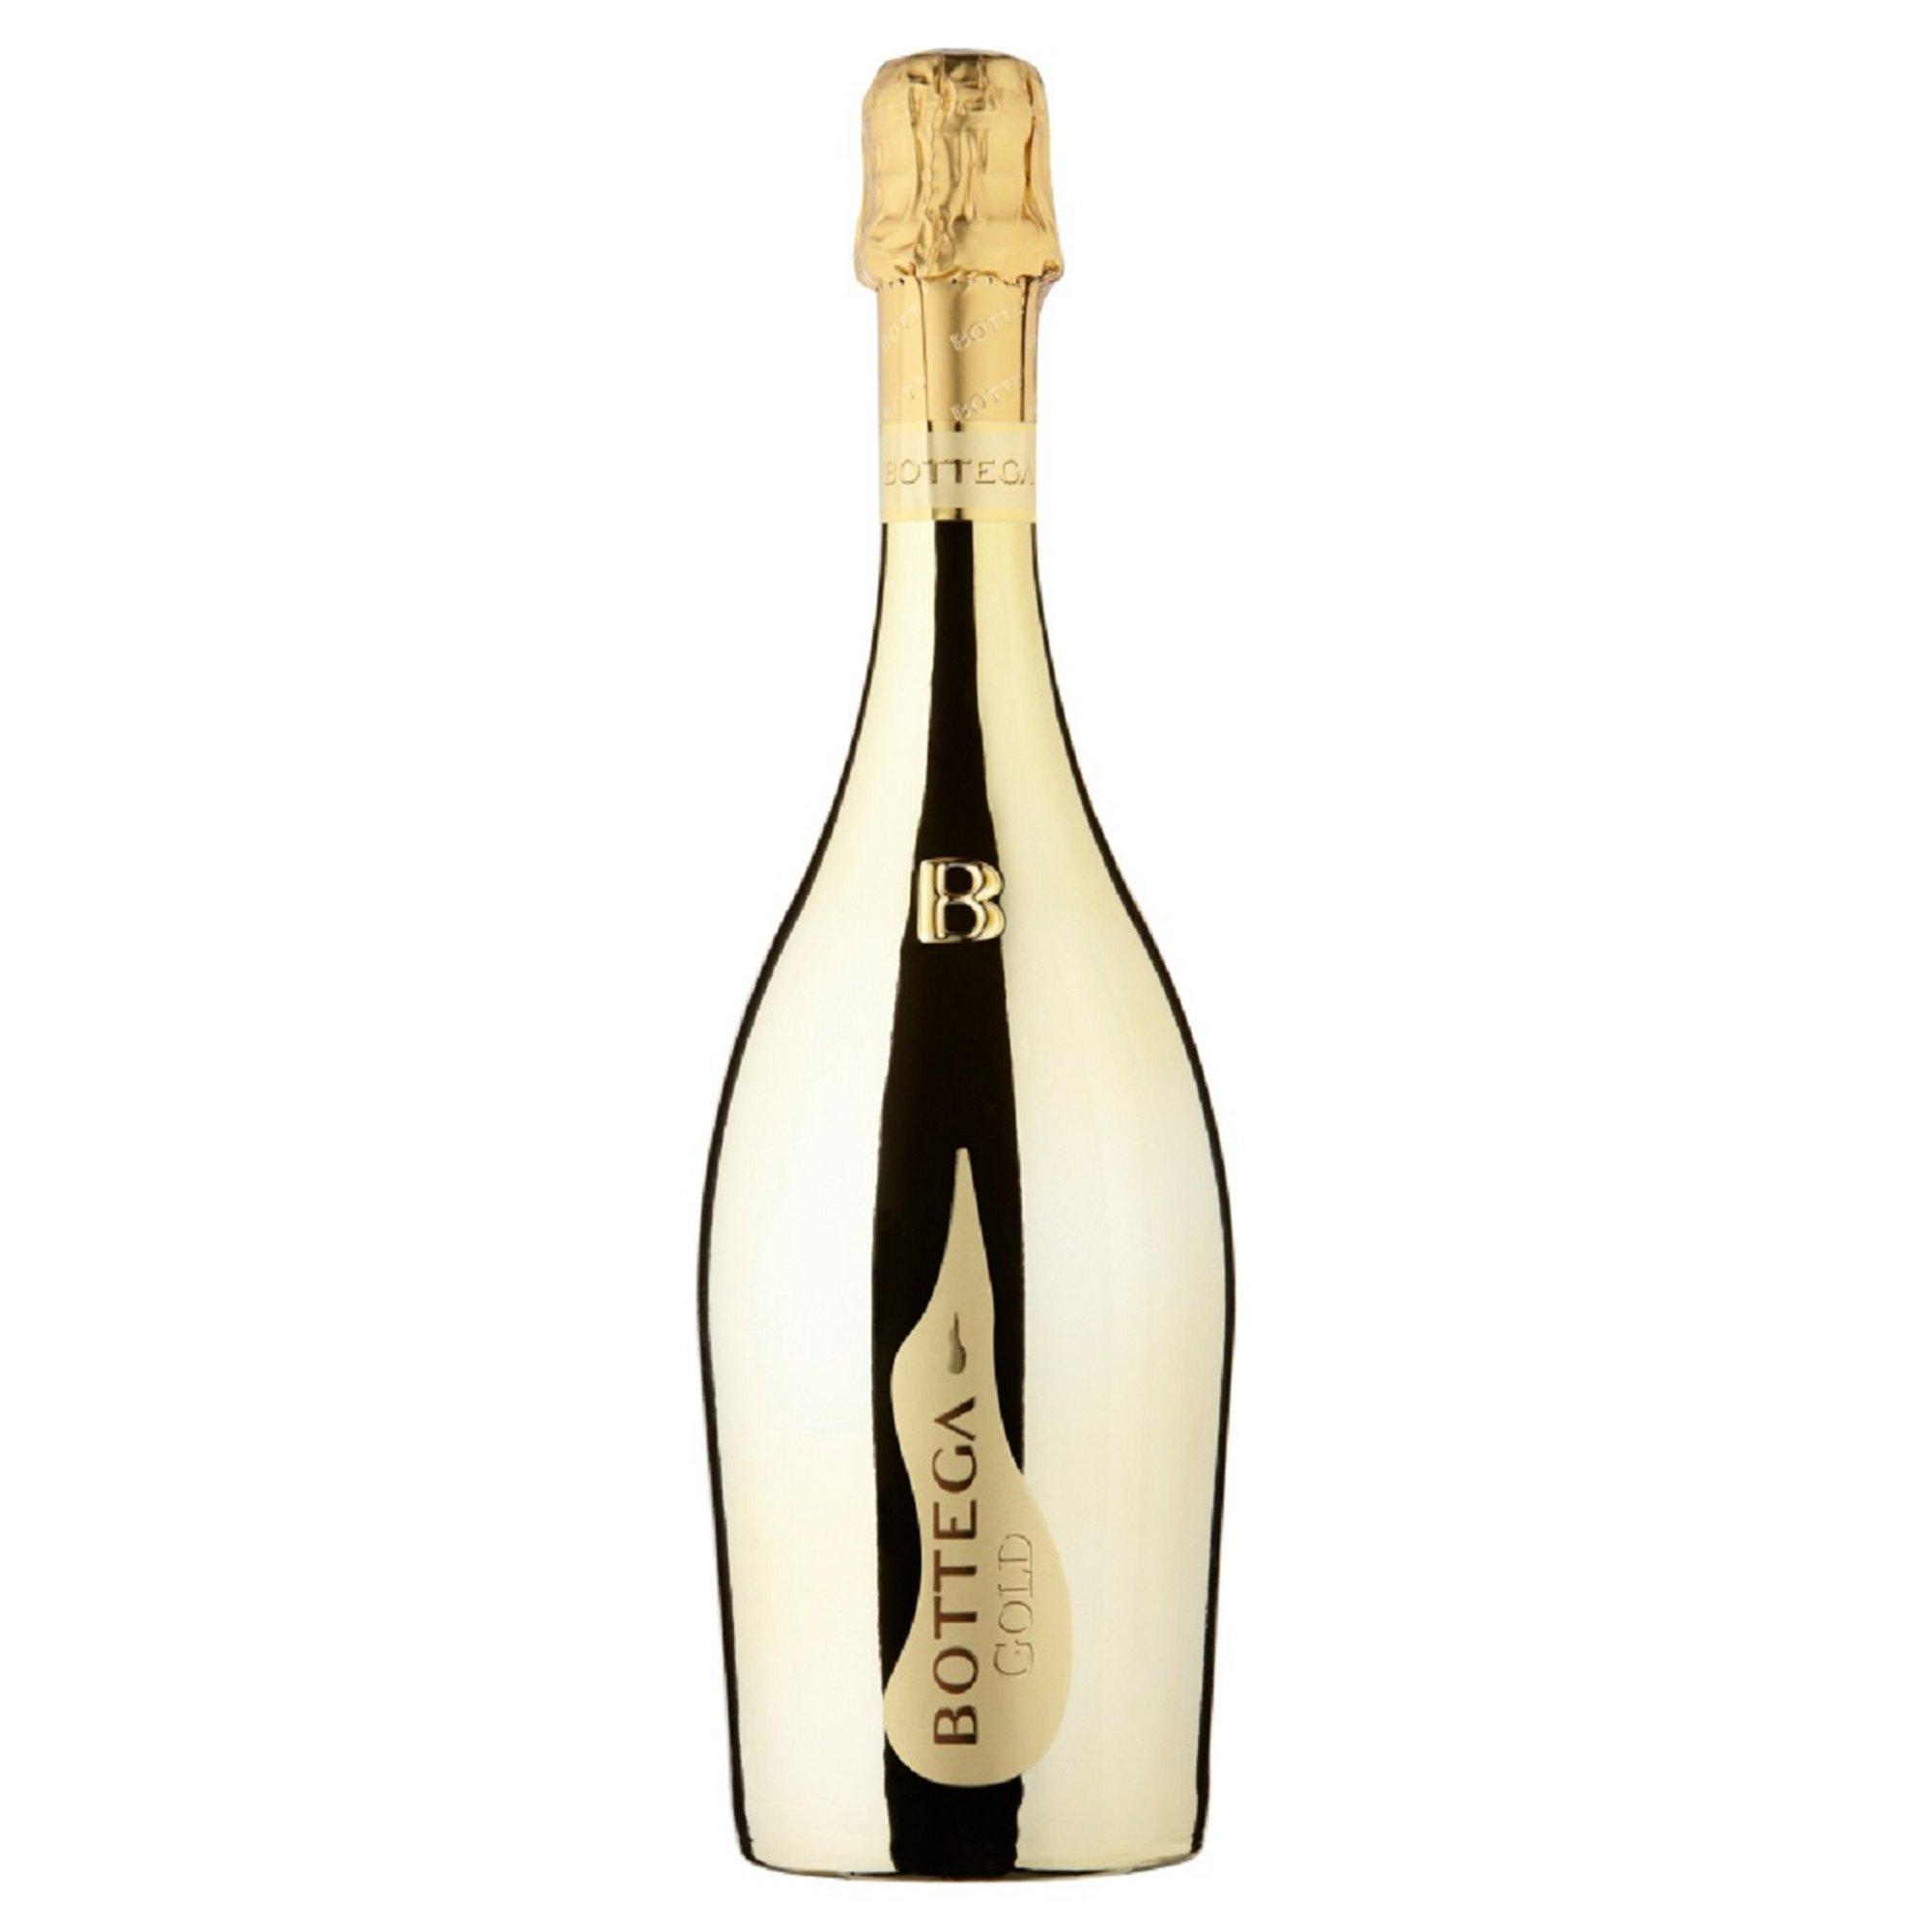 Image of Bottega Gold Prosecco Brut 75cl